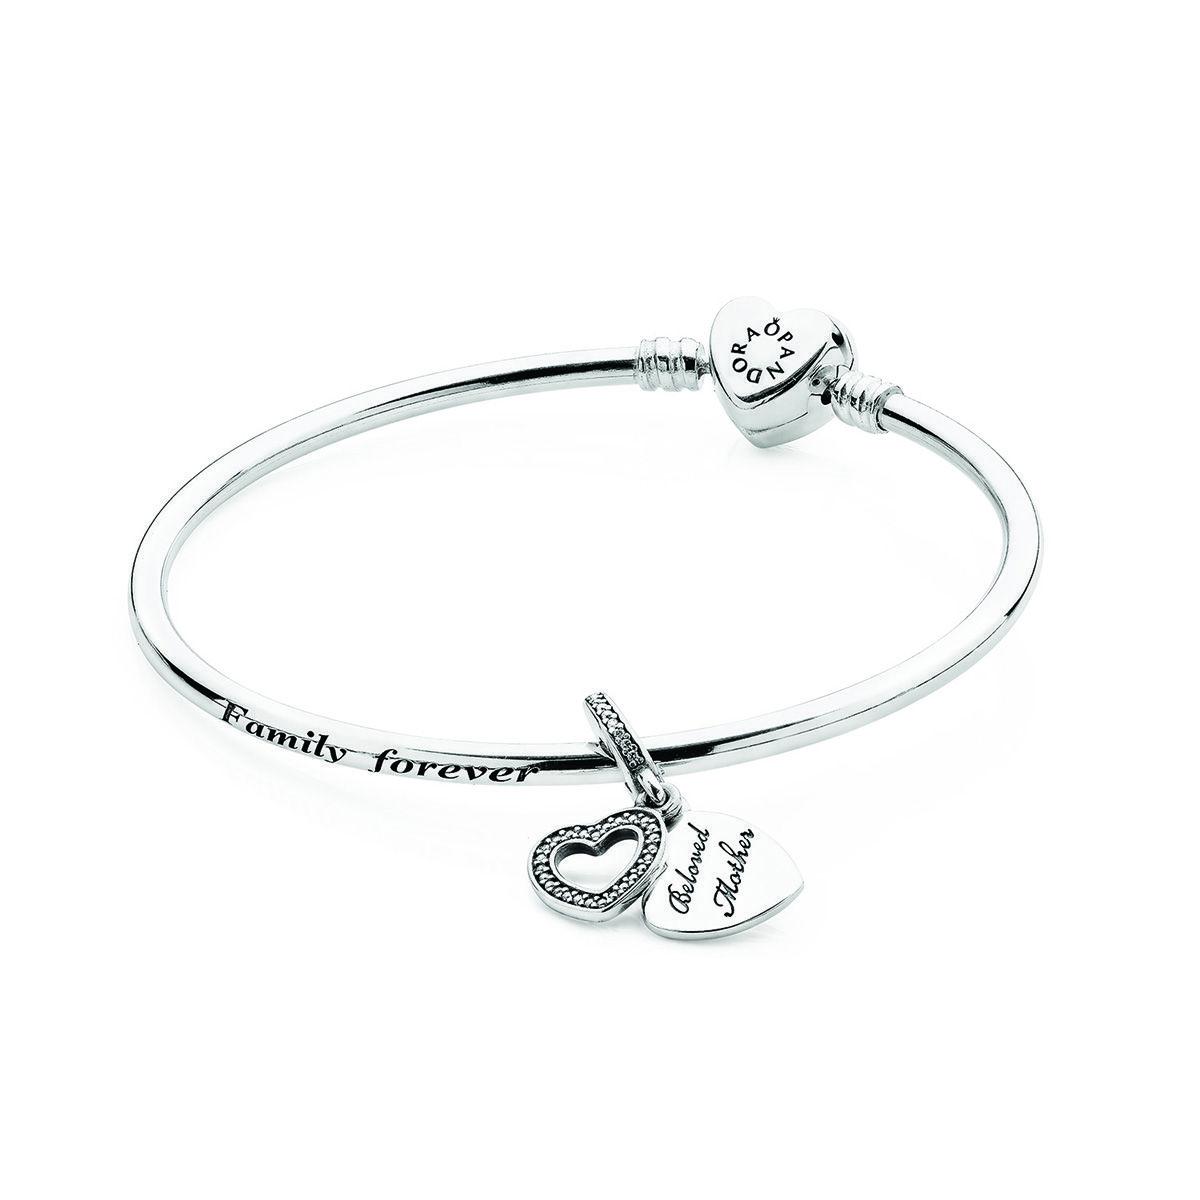 PANDORA A Mother's Love Bangle Gift Set RETIRED | Pandora bracelet ...